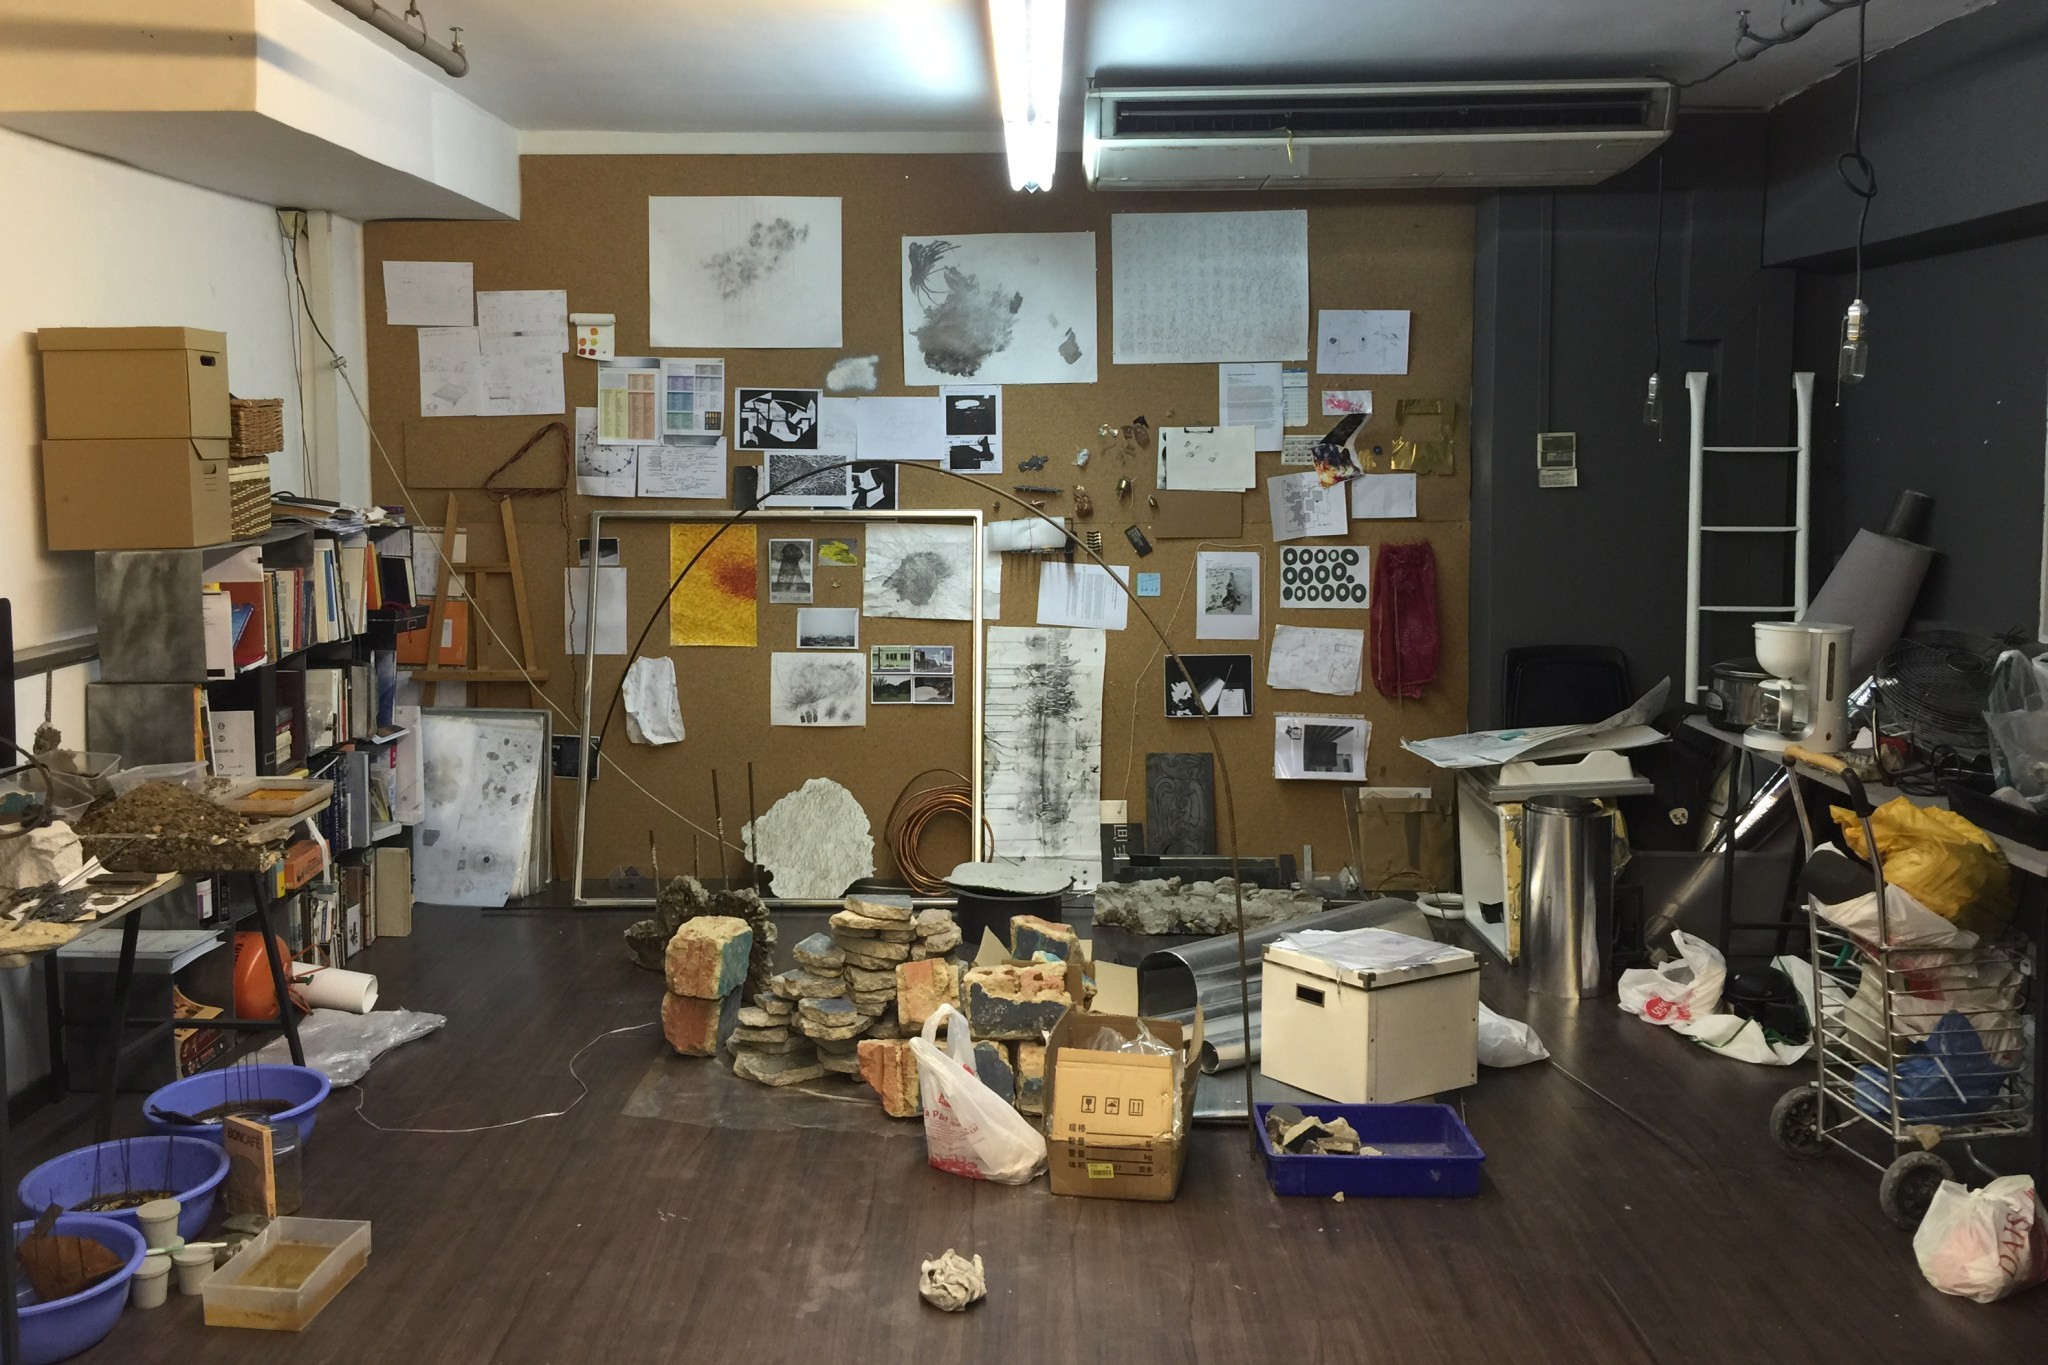 tay-ining-studio-wall